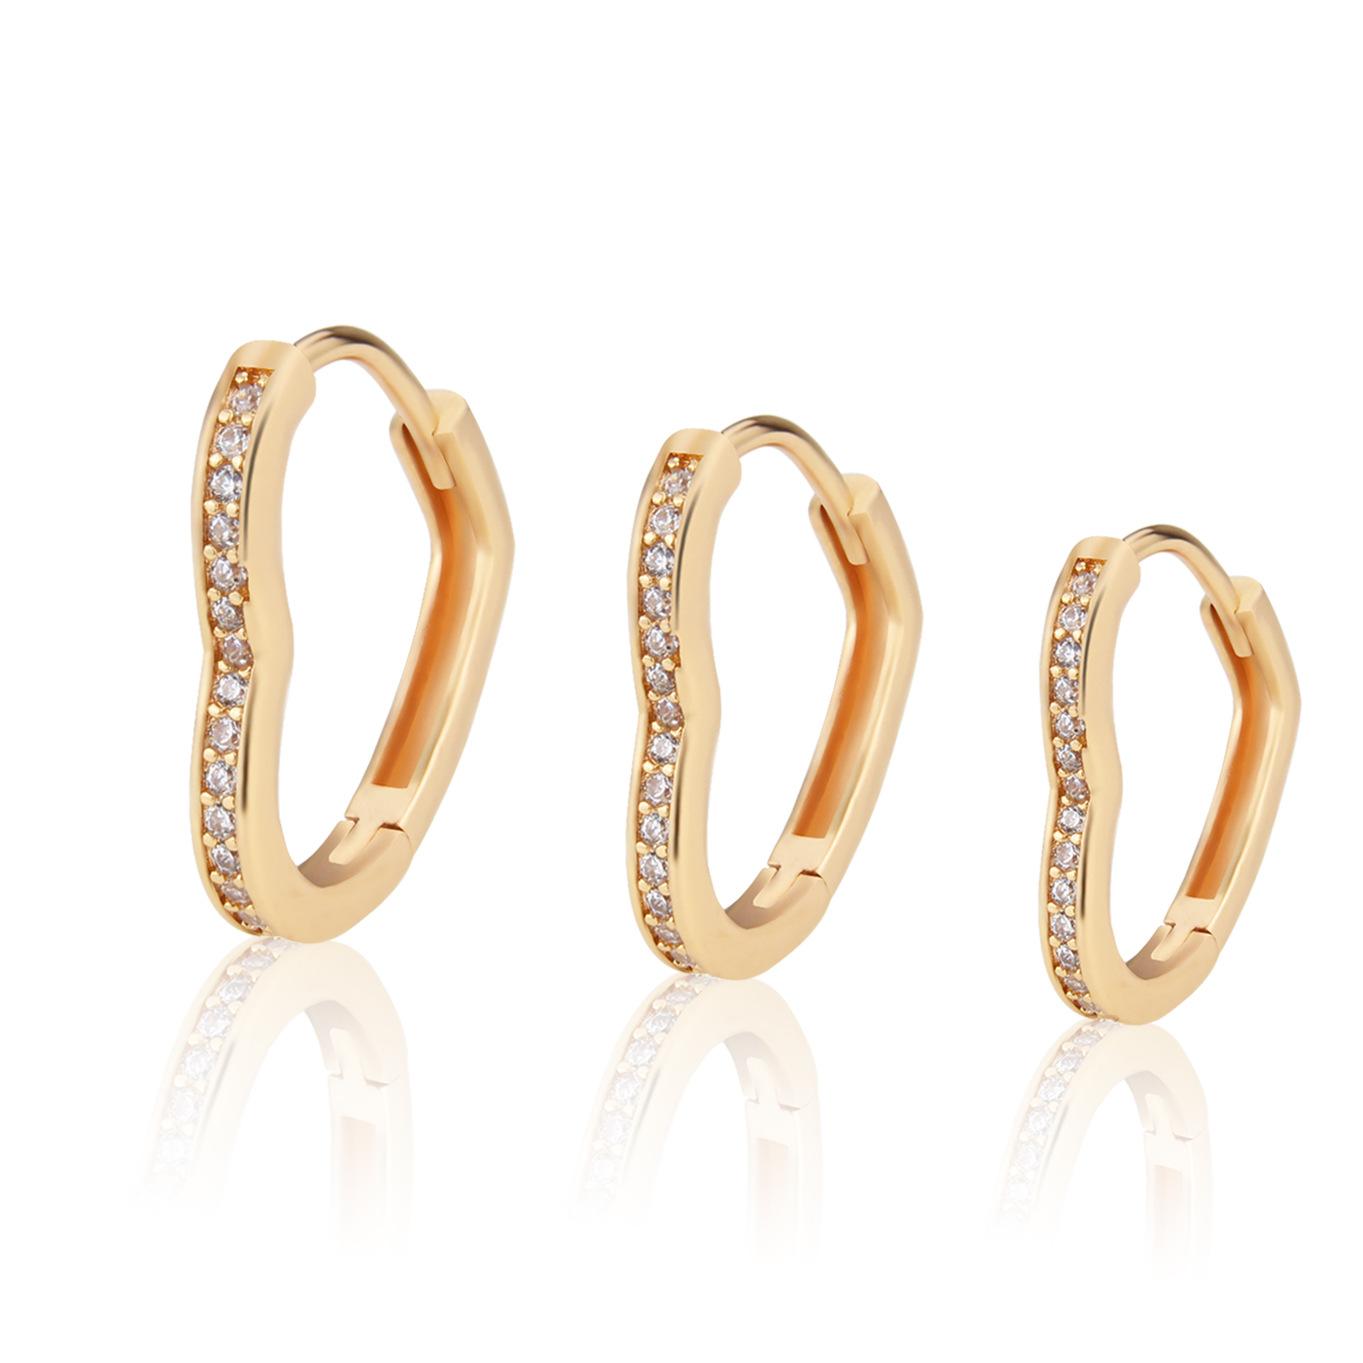 Fashion diamond heartshaped earrings  NHBP364209